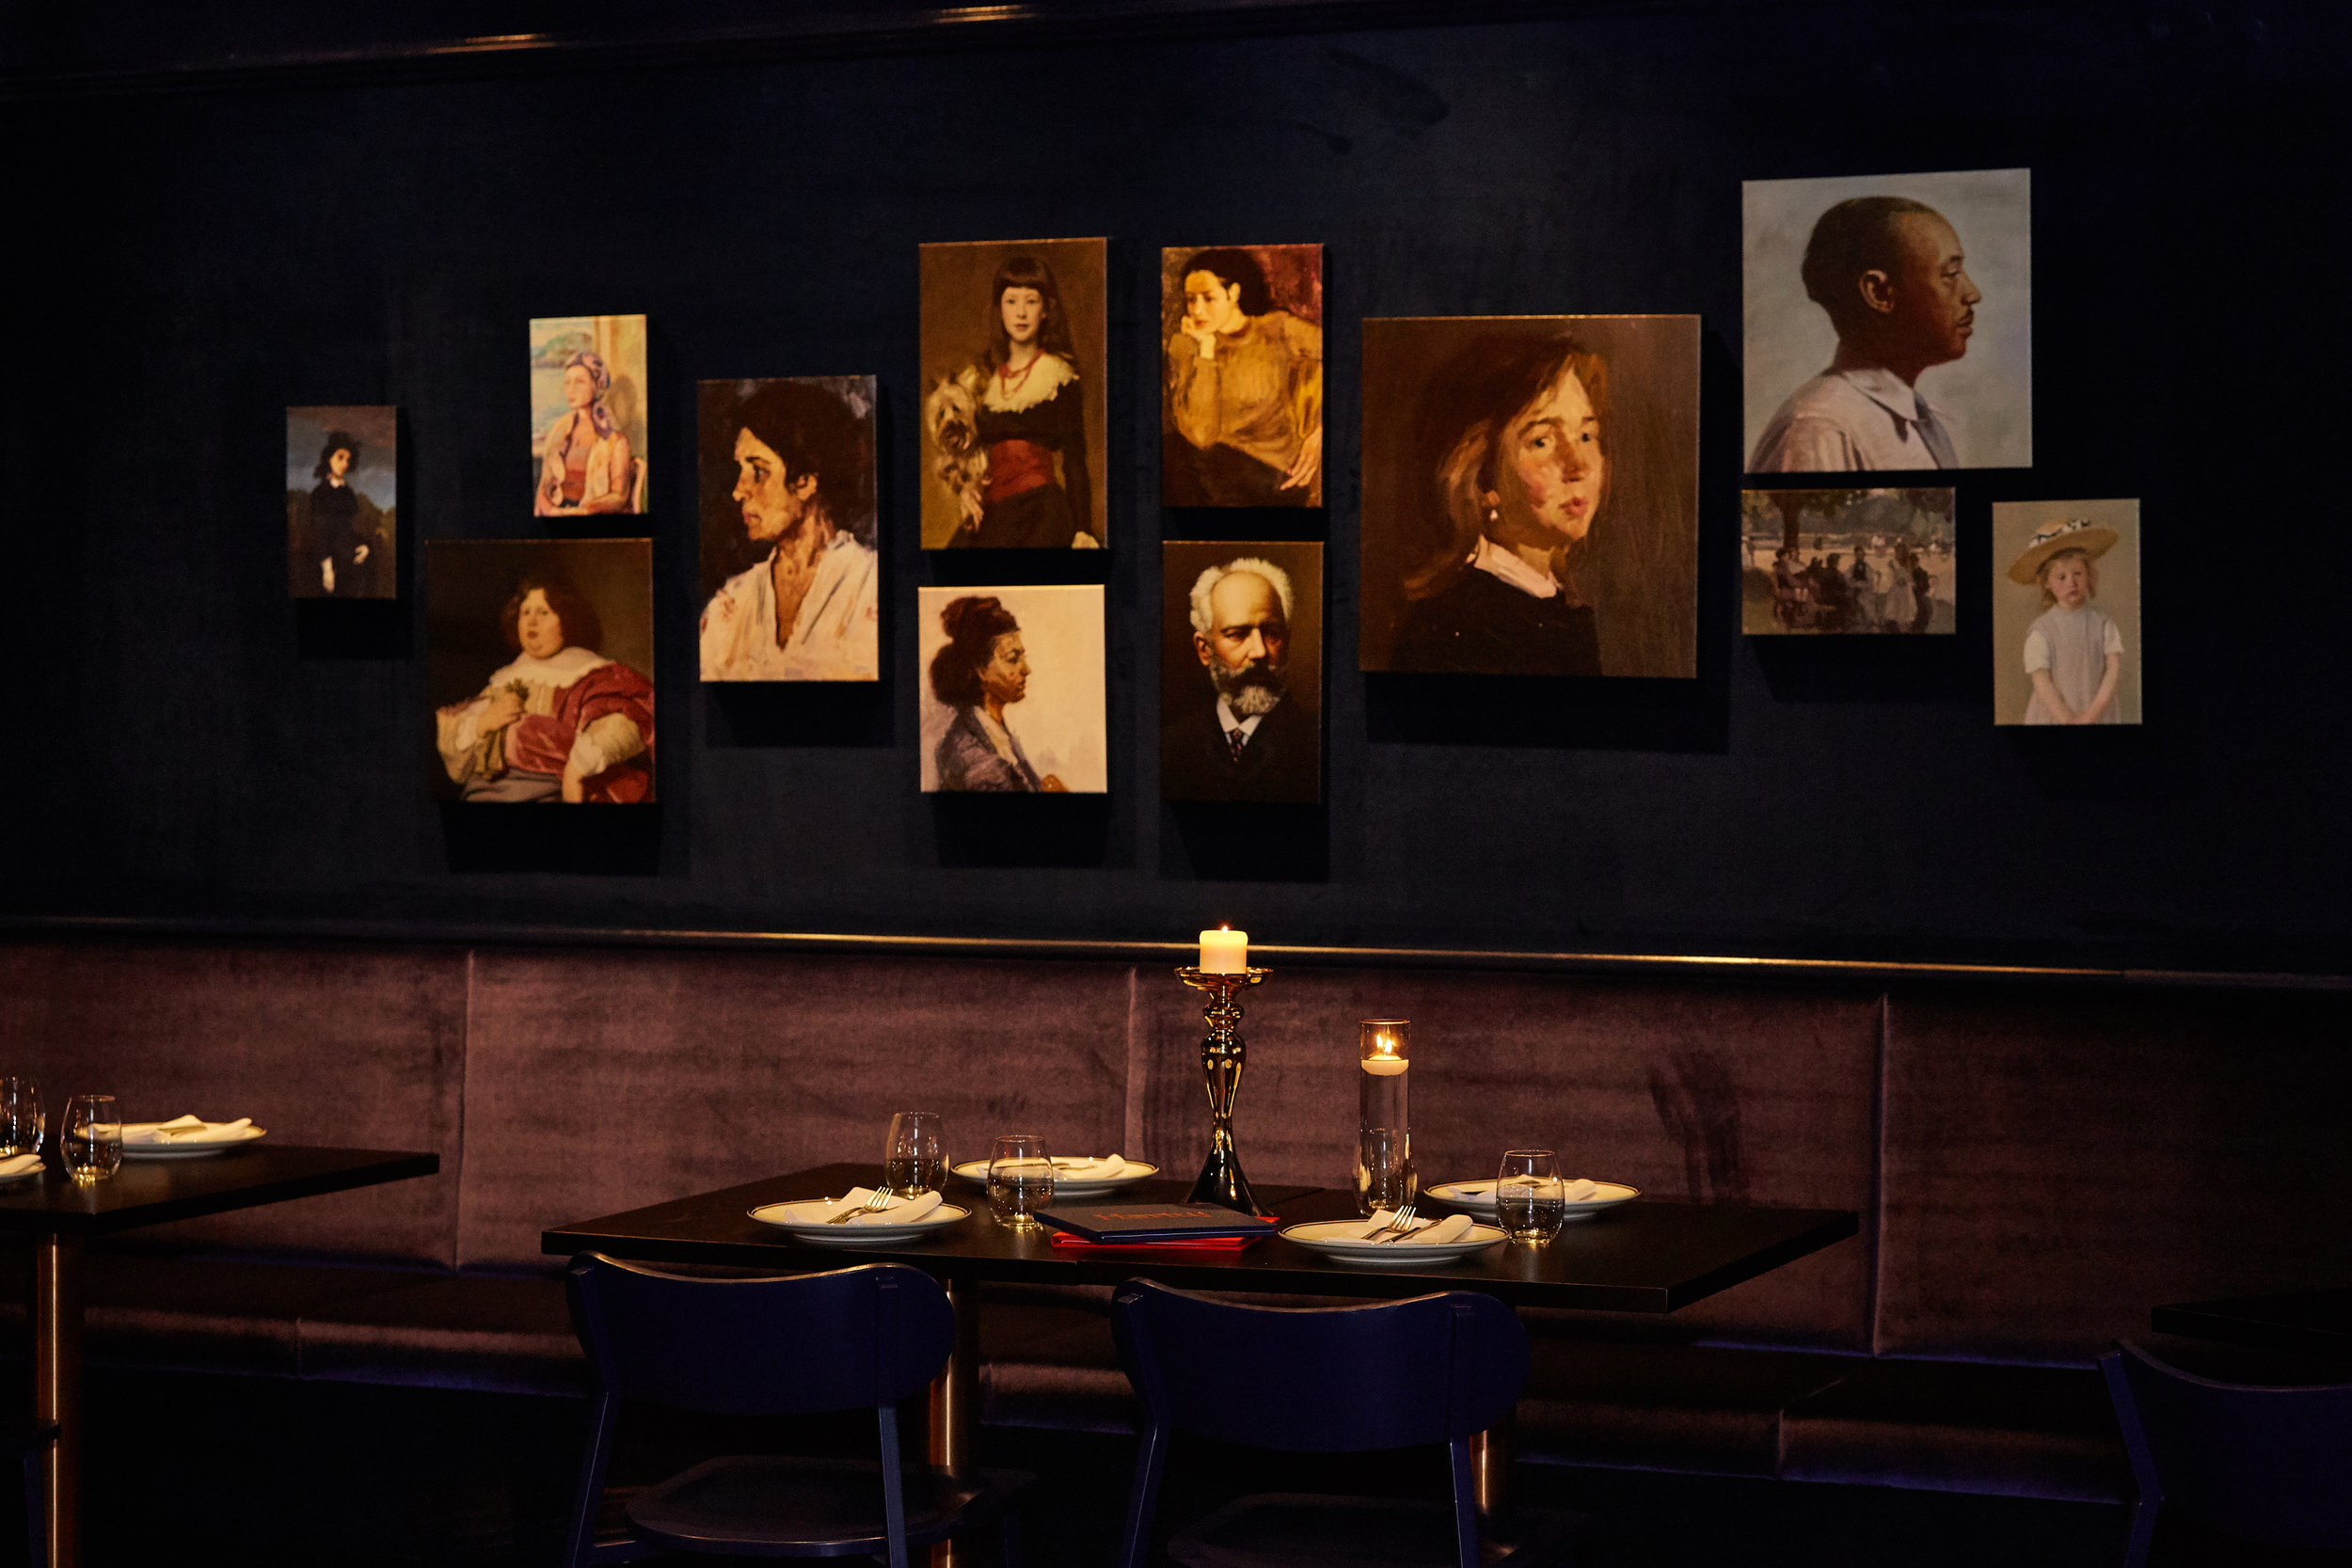 Heritij_Restaurant_Opening_Night_Brisbane, Mark_Buckley_Photography